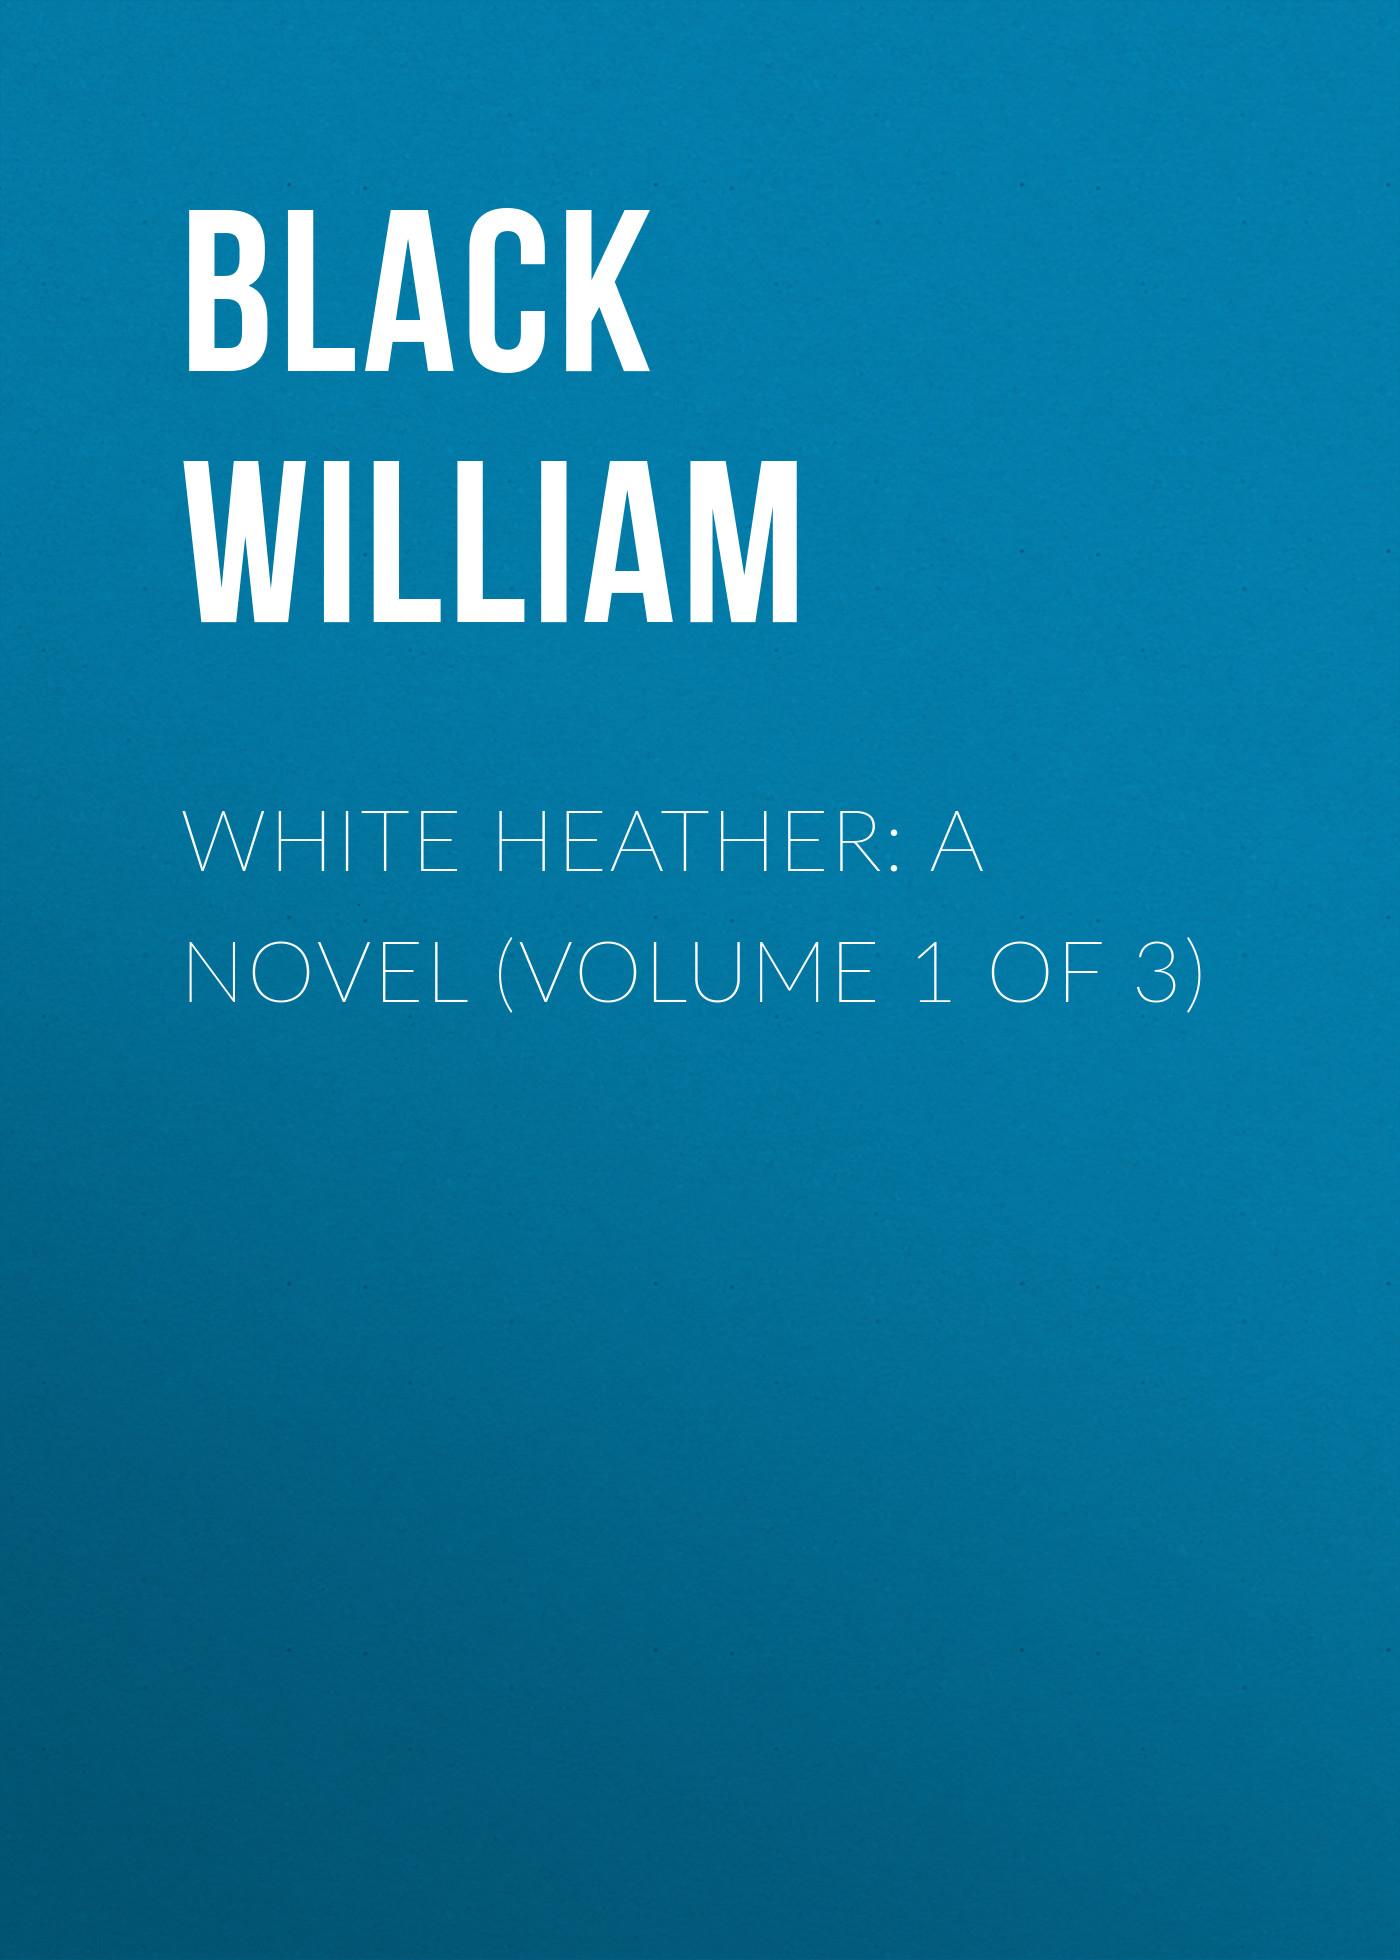 White Heather: A Novel (Volume 1 of 3)